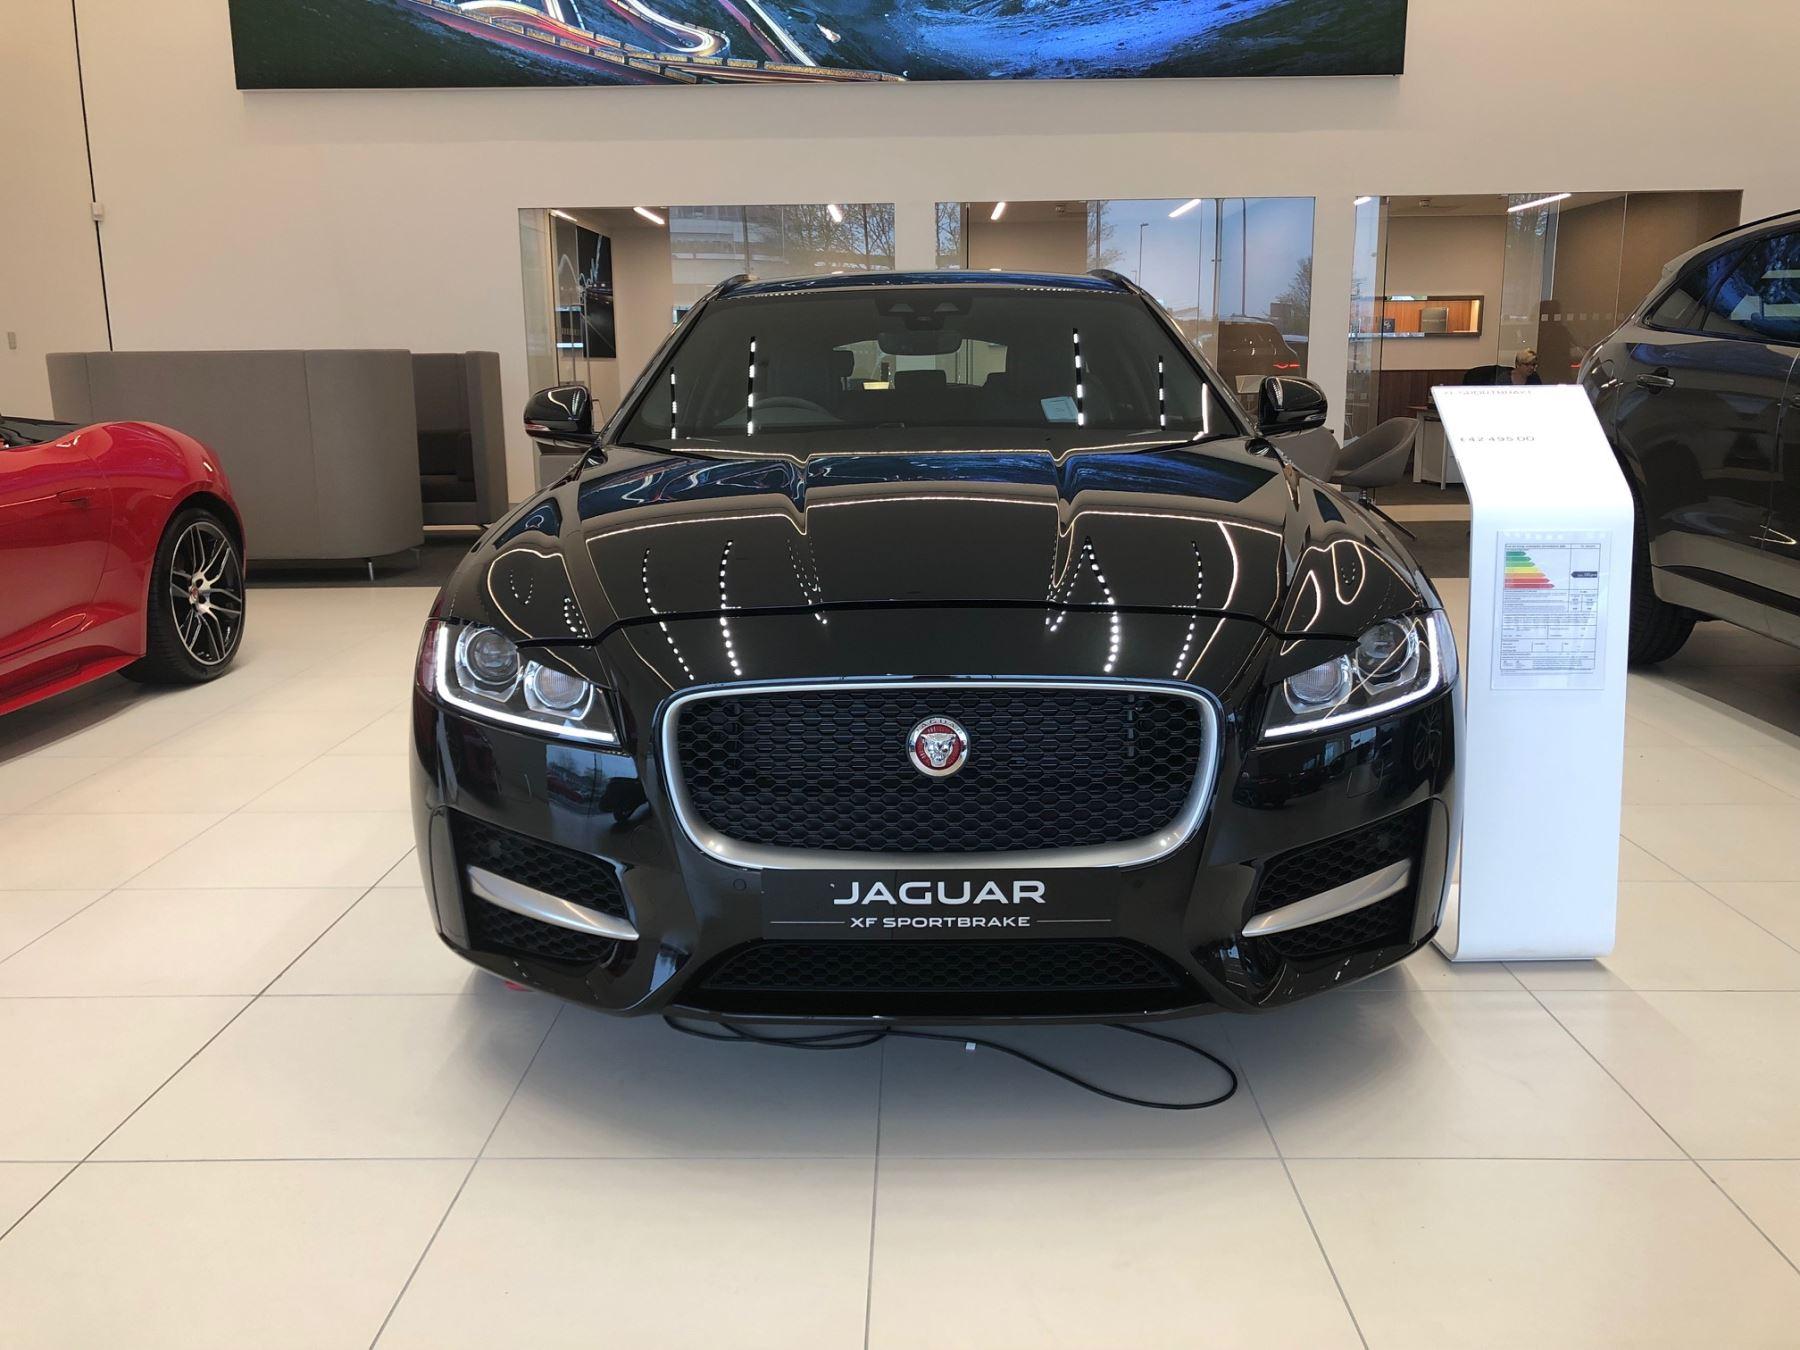 Jaguar XF SPORTBRAKE 2.0d R-Sport Diesel Automatic 5 door Estate (17MY) image